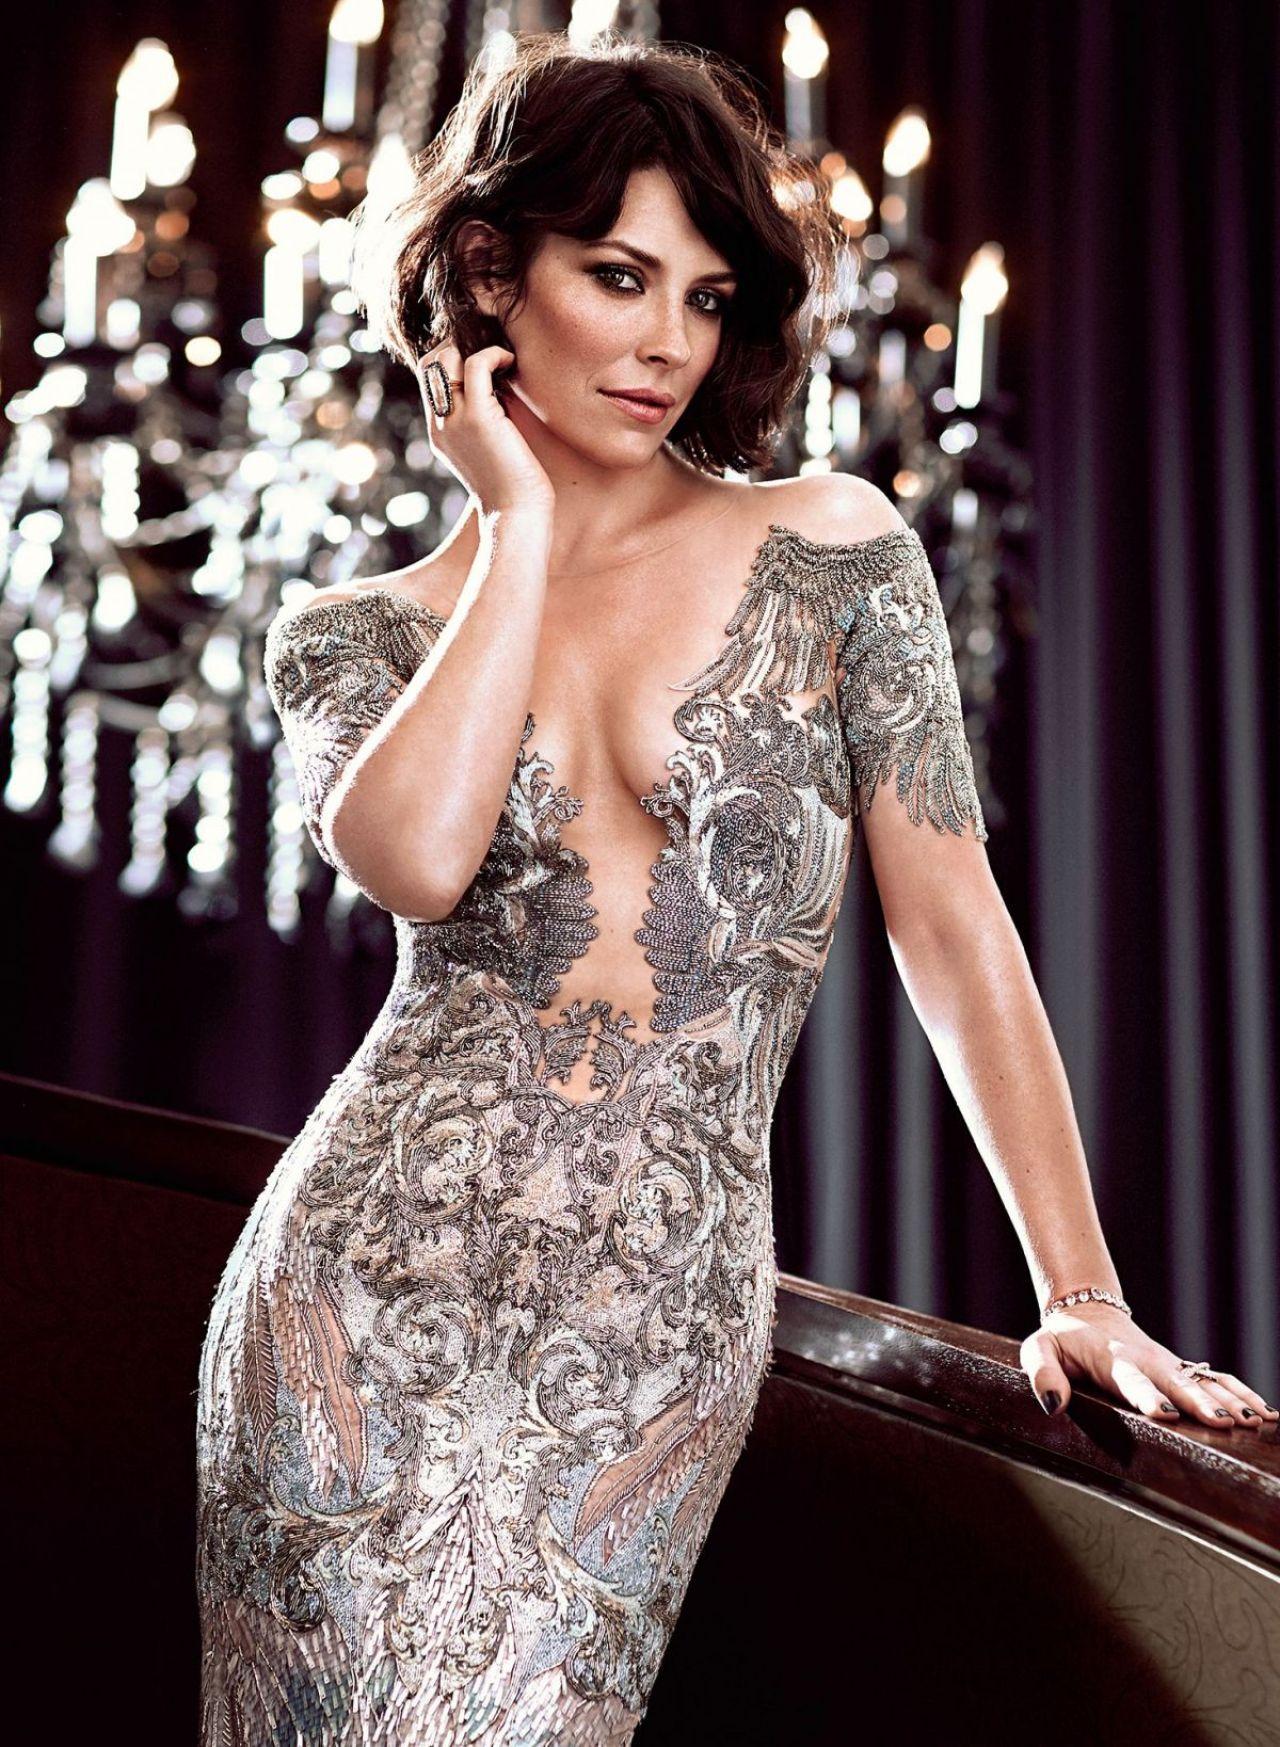 Watch Kara del toro cleavage pics video